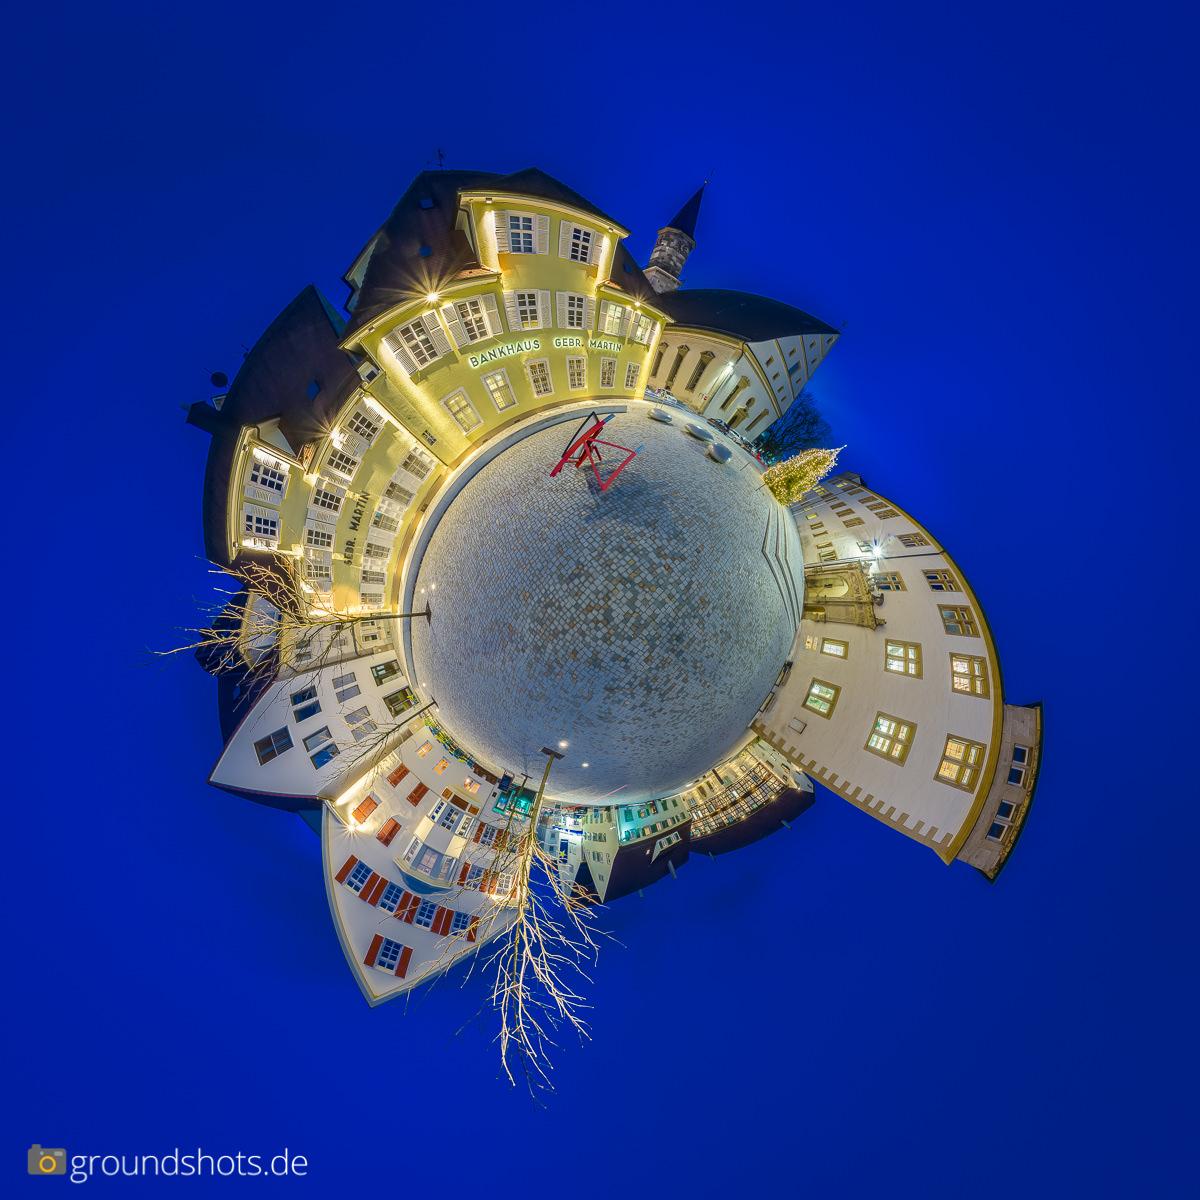 Little Planet Schlossplatz in Goeppingen